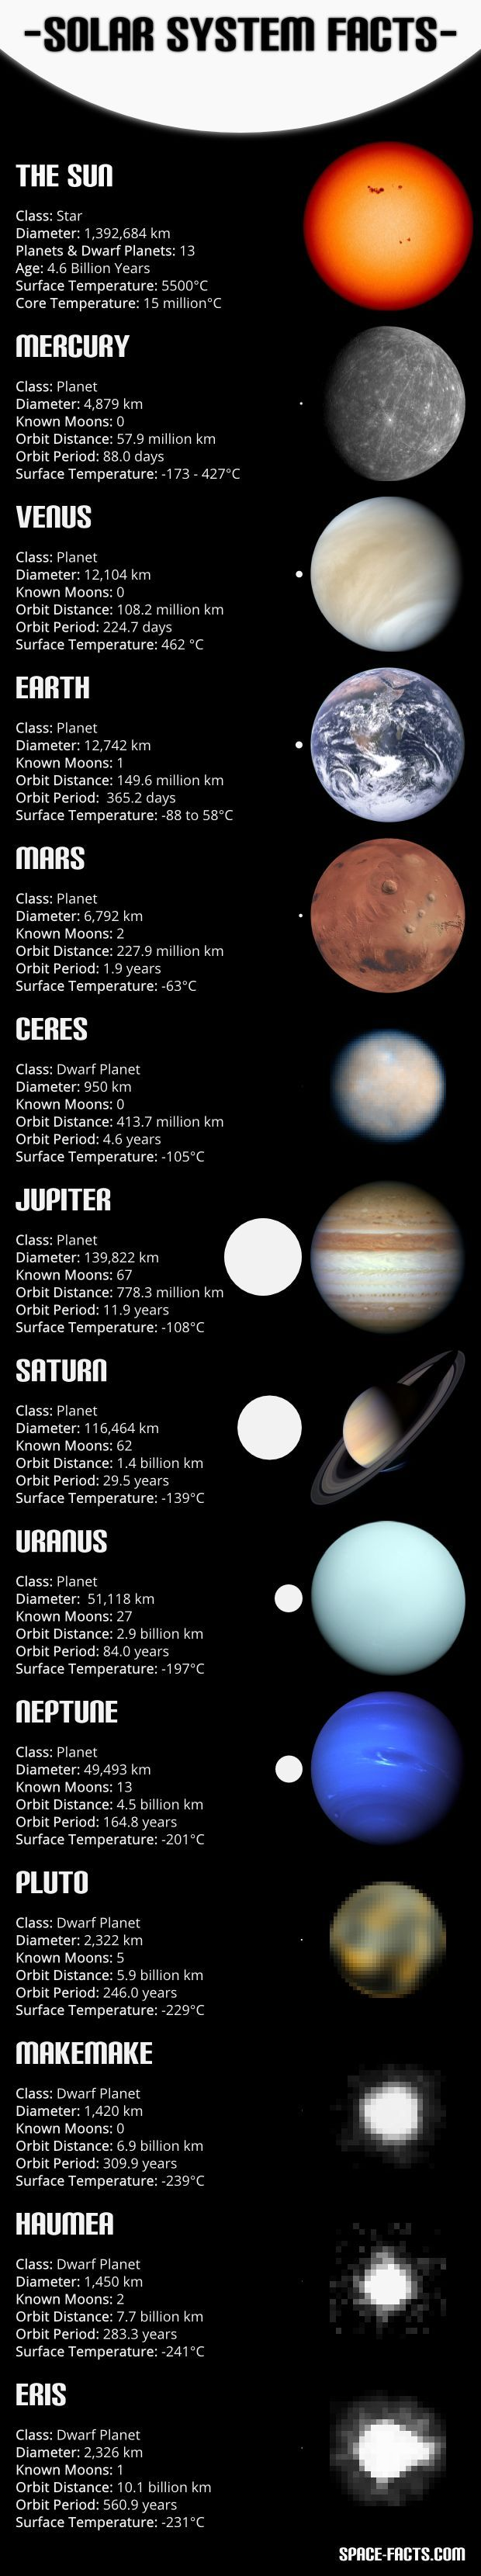 Solar system facts | SPACE | LET'S GO! | Pinterest